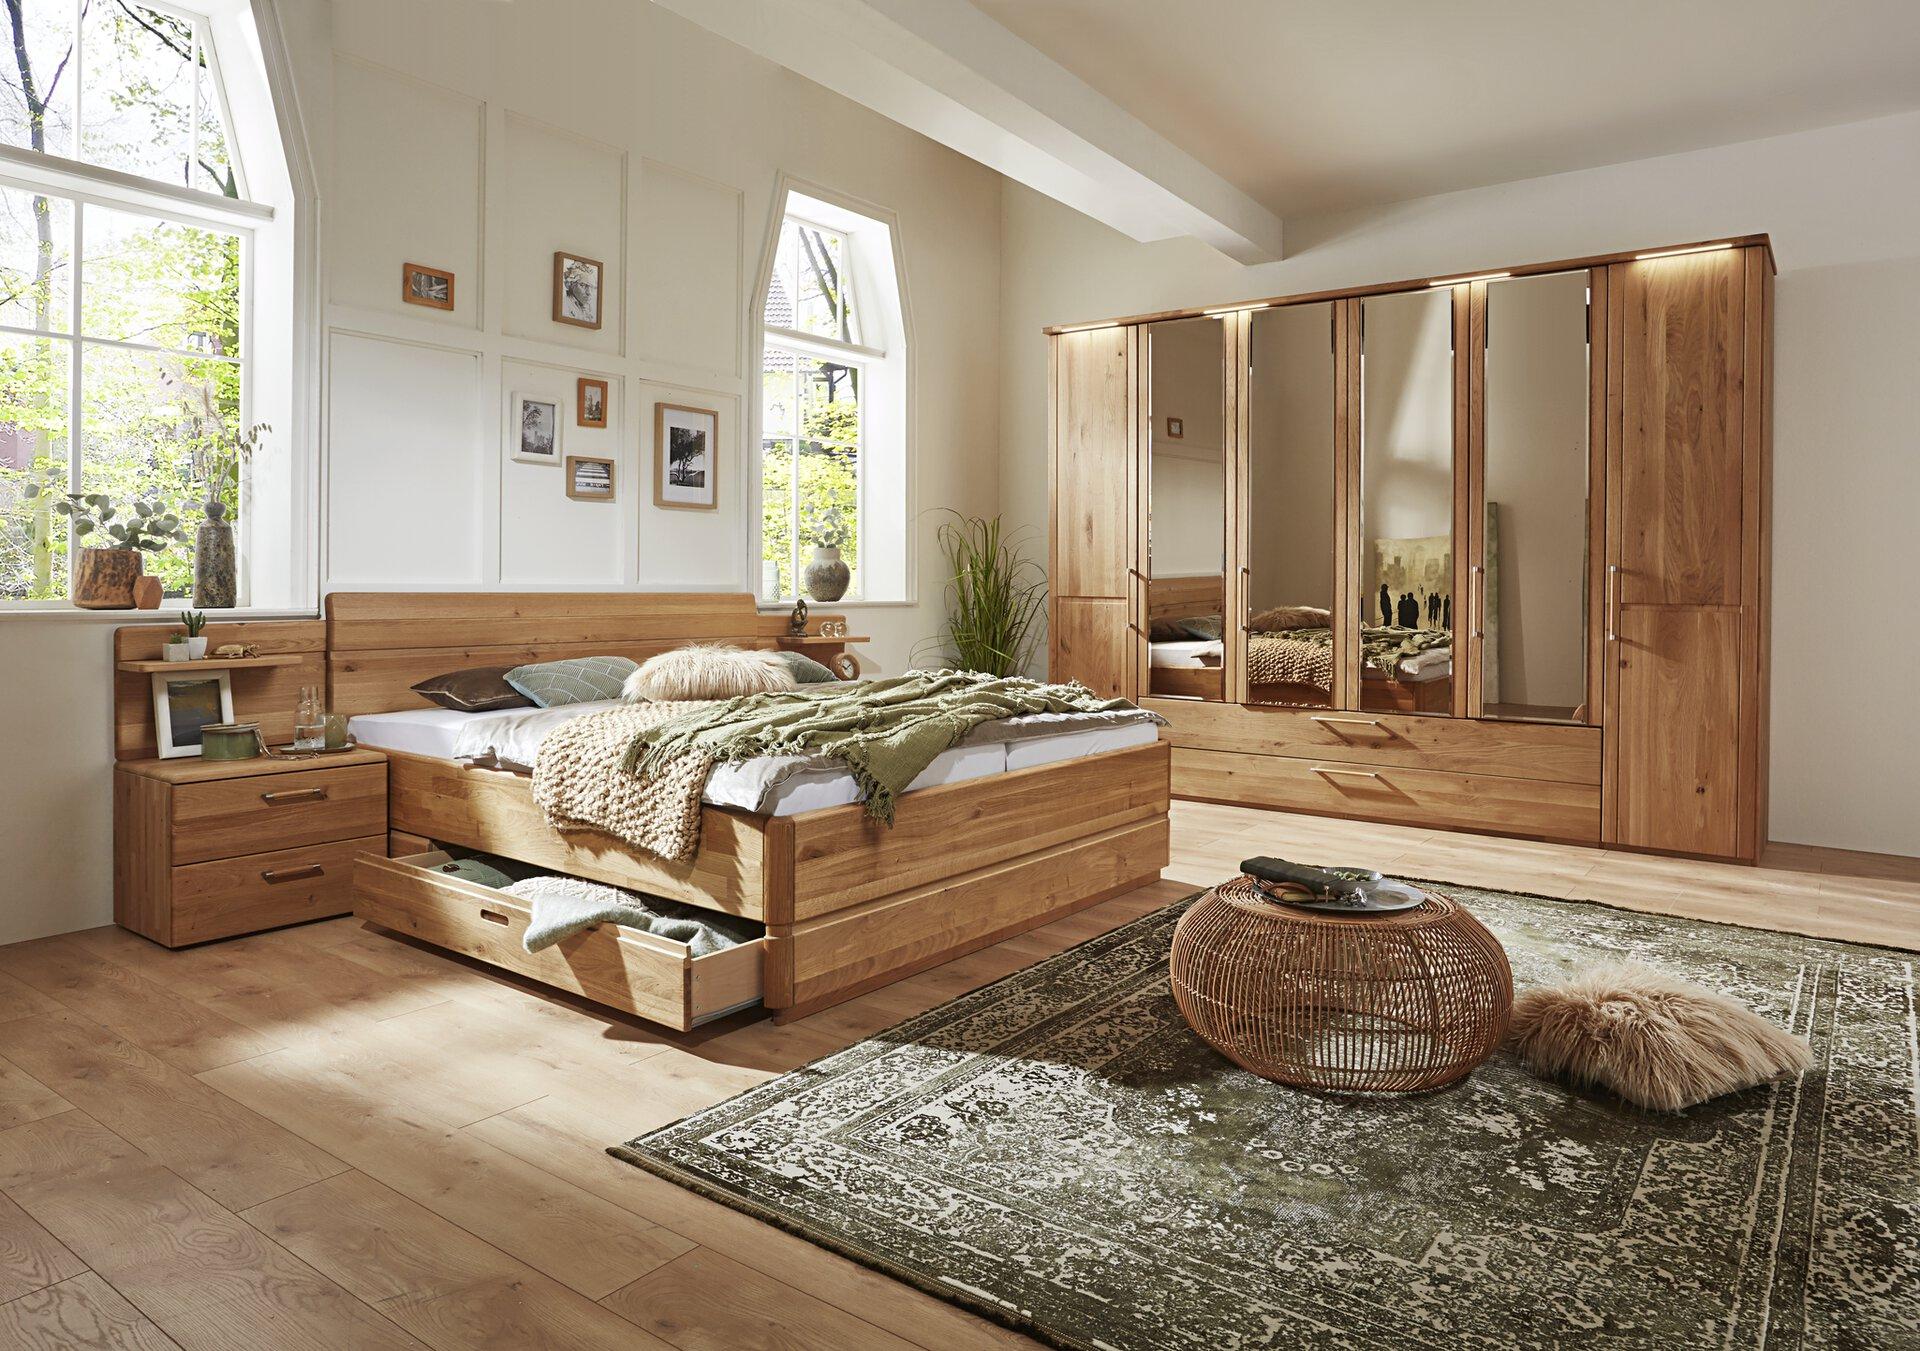 Schlafzimmer Trento Plus VALMONDO Holz braun 208 x 96 x 189 cm